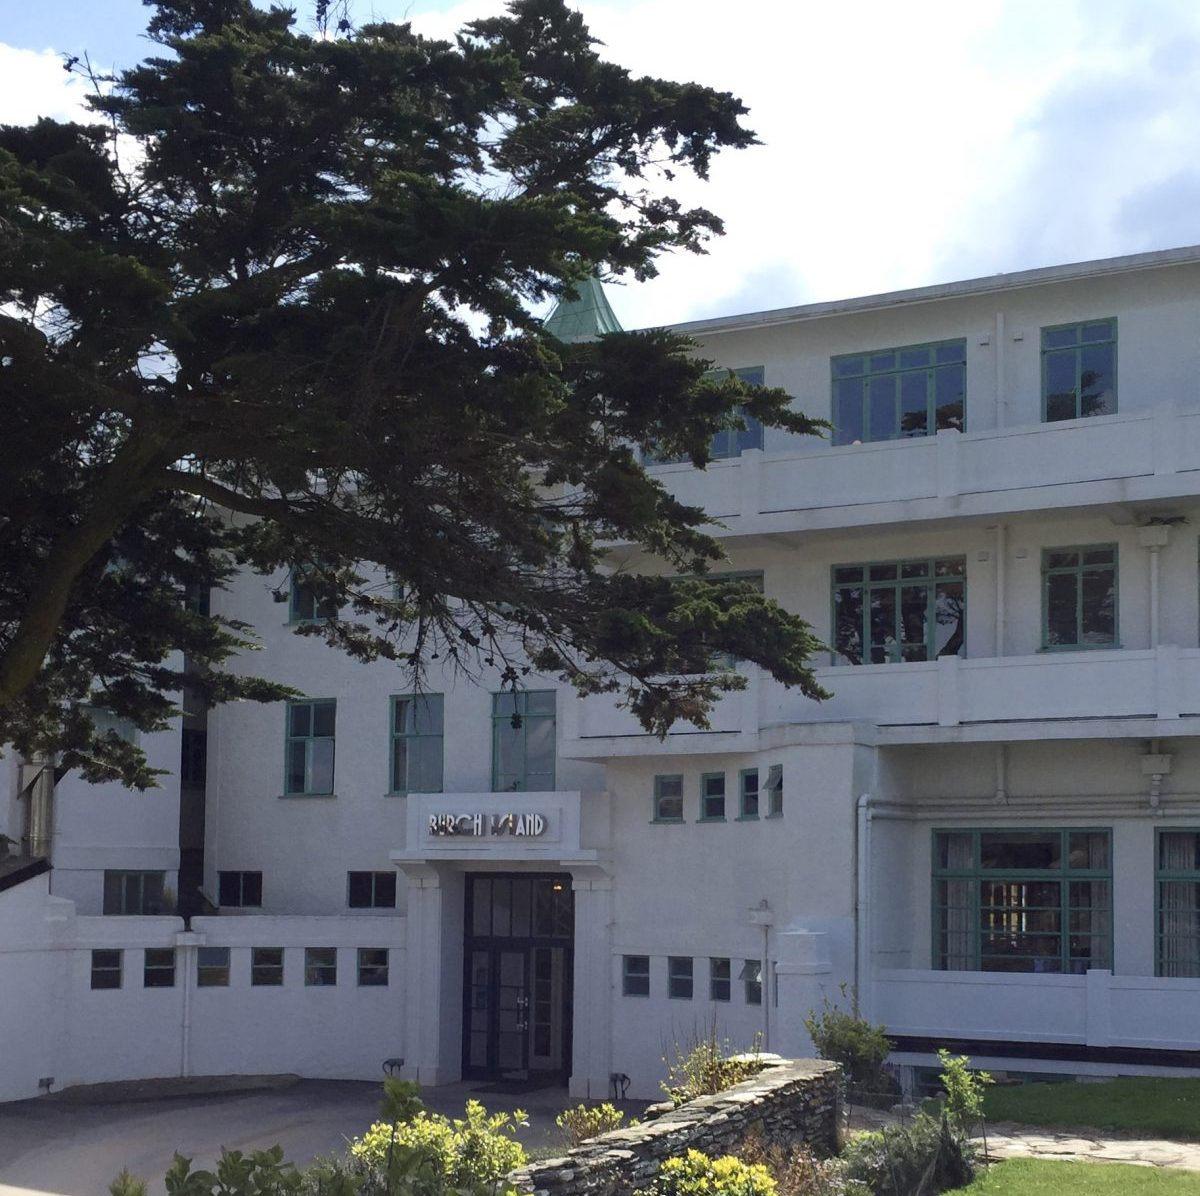 Burgh island hotel papilionaceous jacquard silk ribbon for Art deco hotel devon